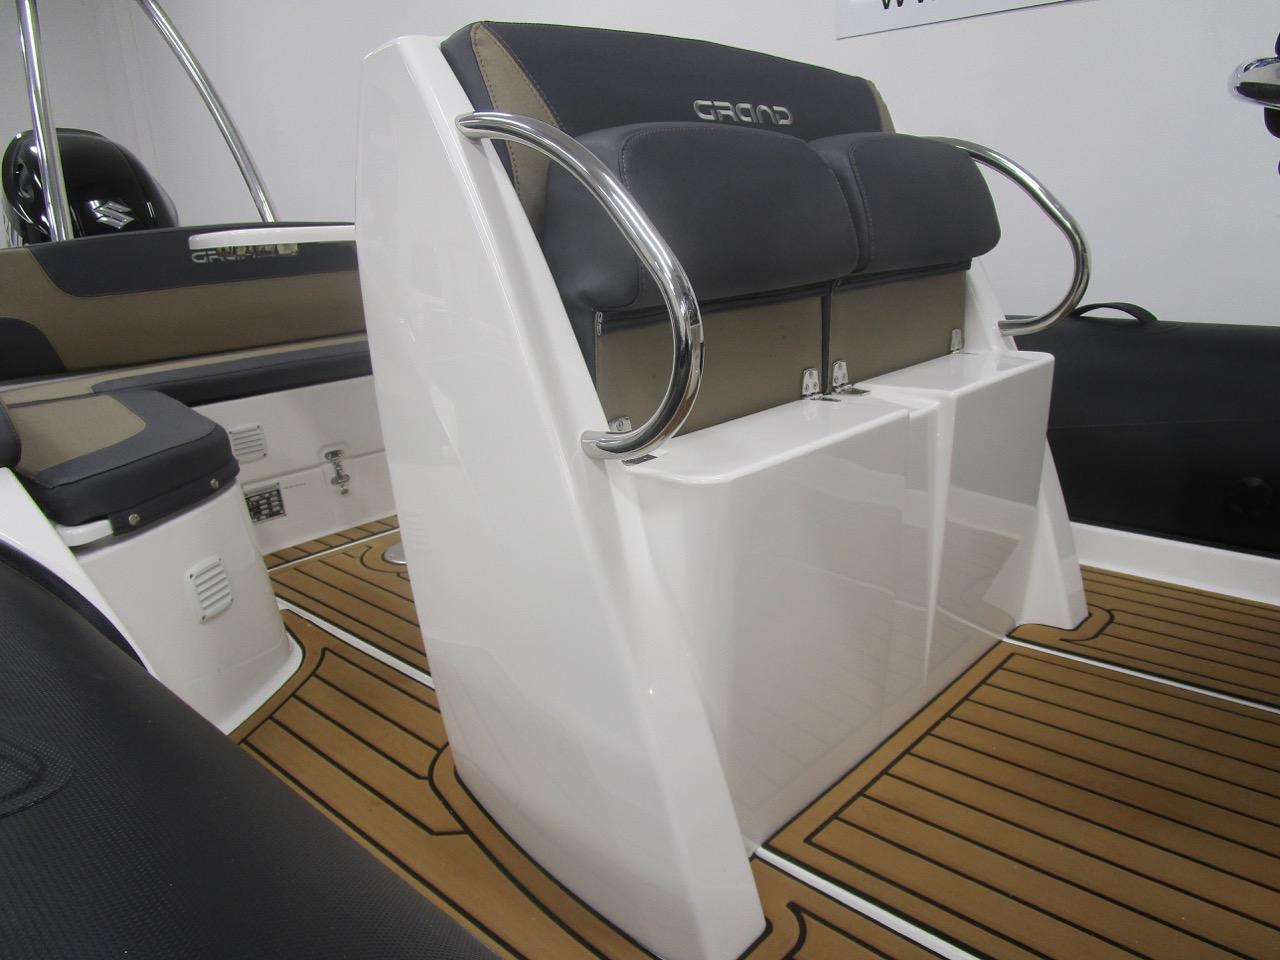 Grand RIB Golden Line G650 helm seats up